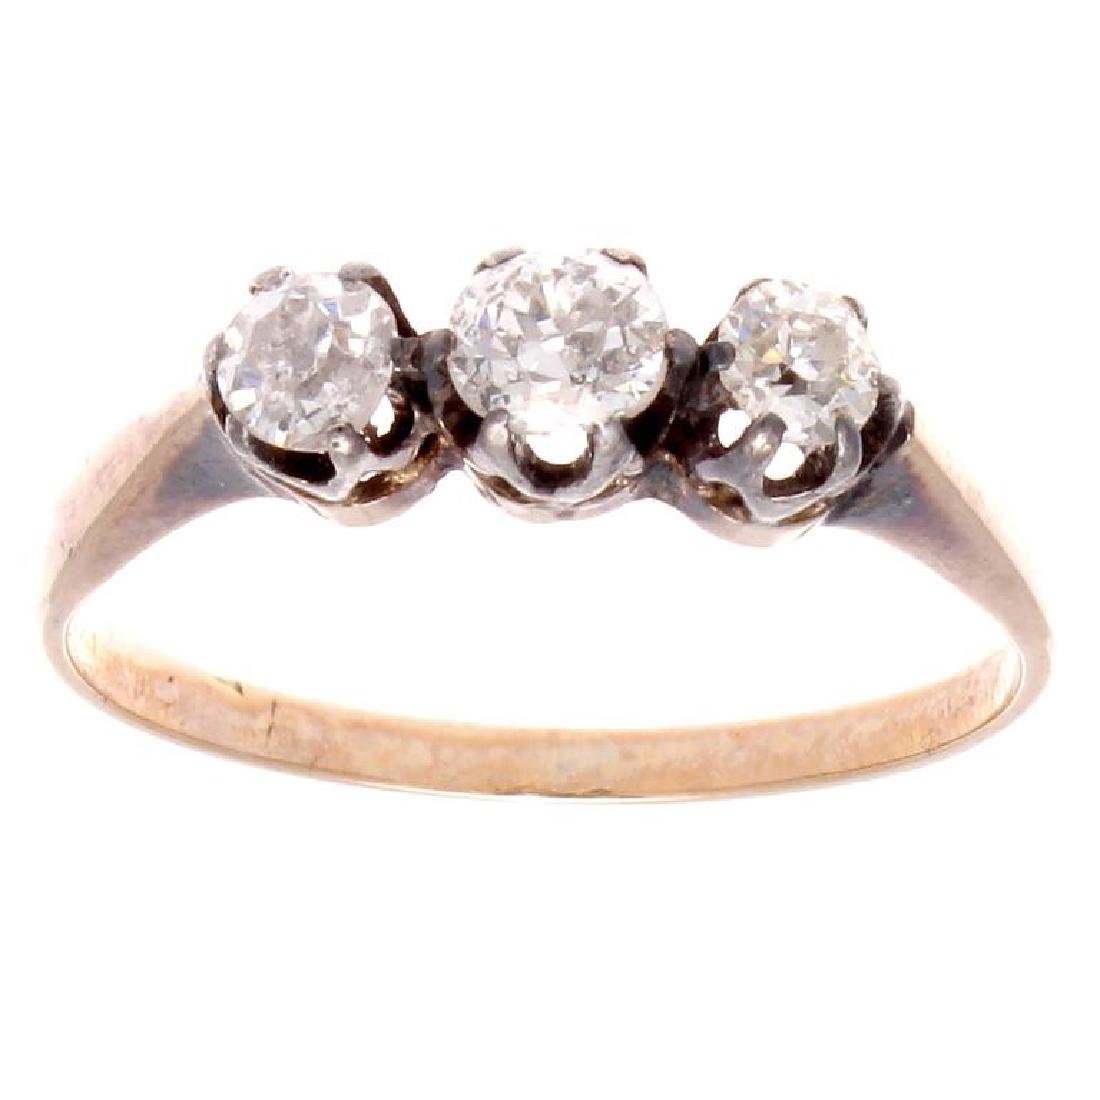 Victorian 18K Gold Three Stone Diamond Ring